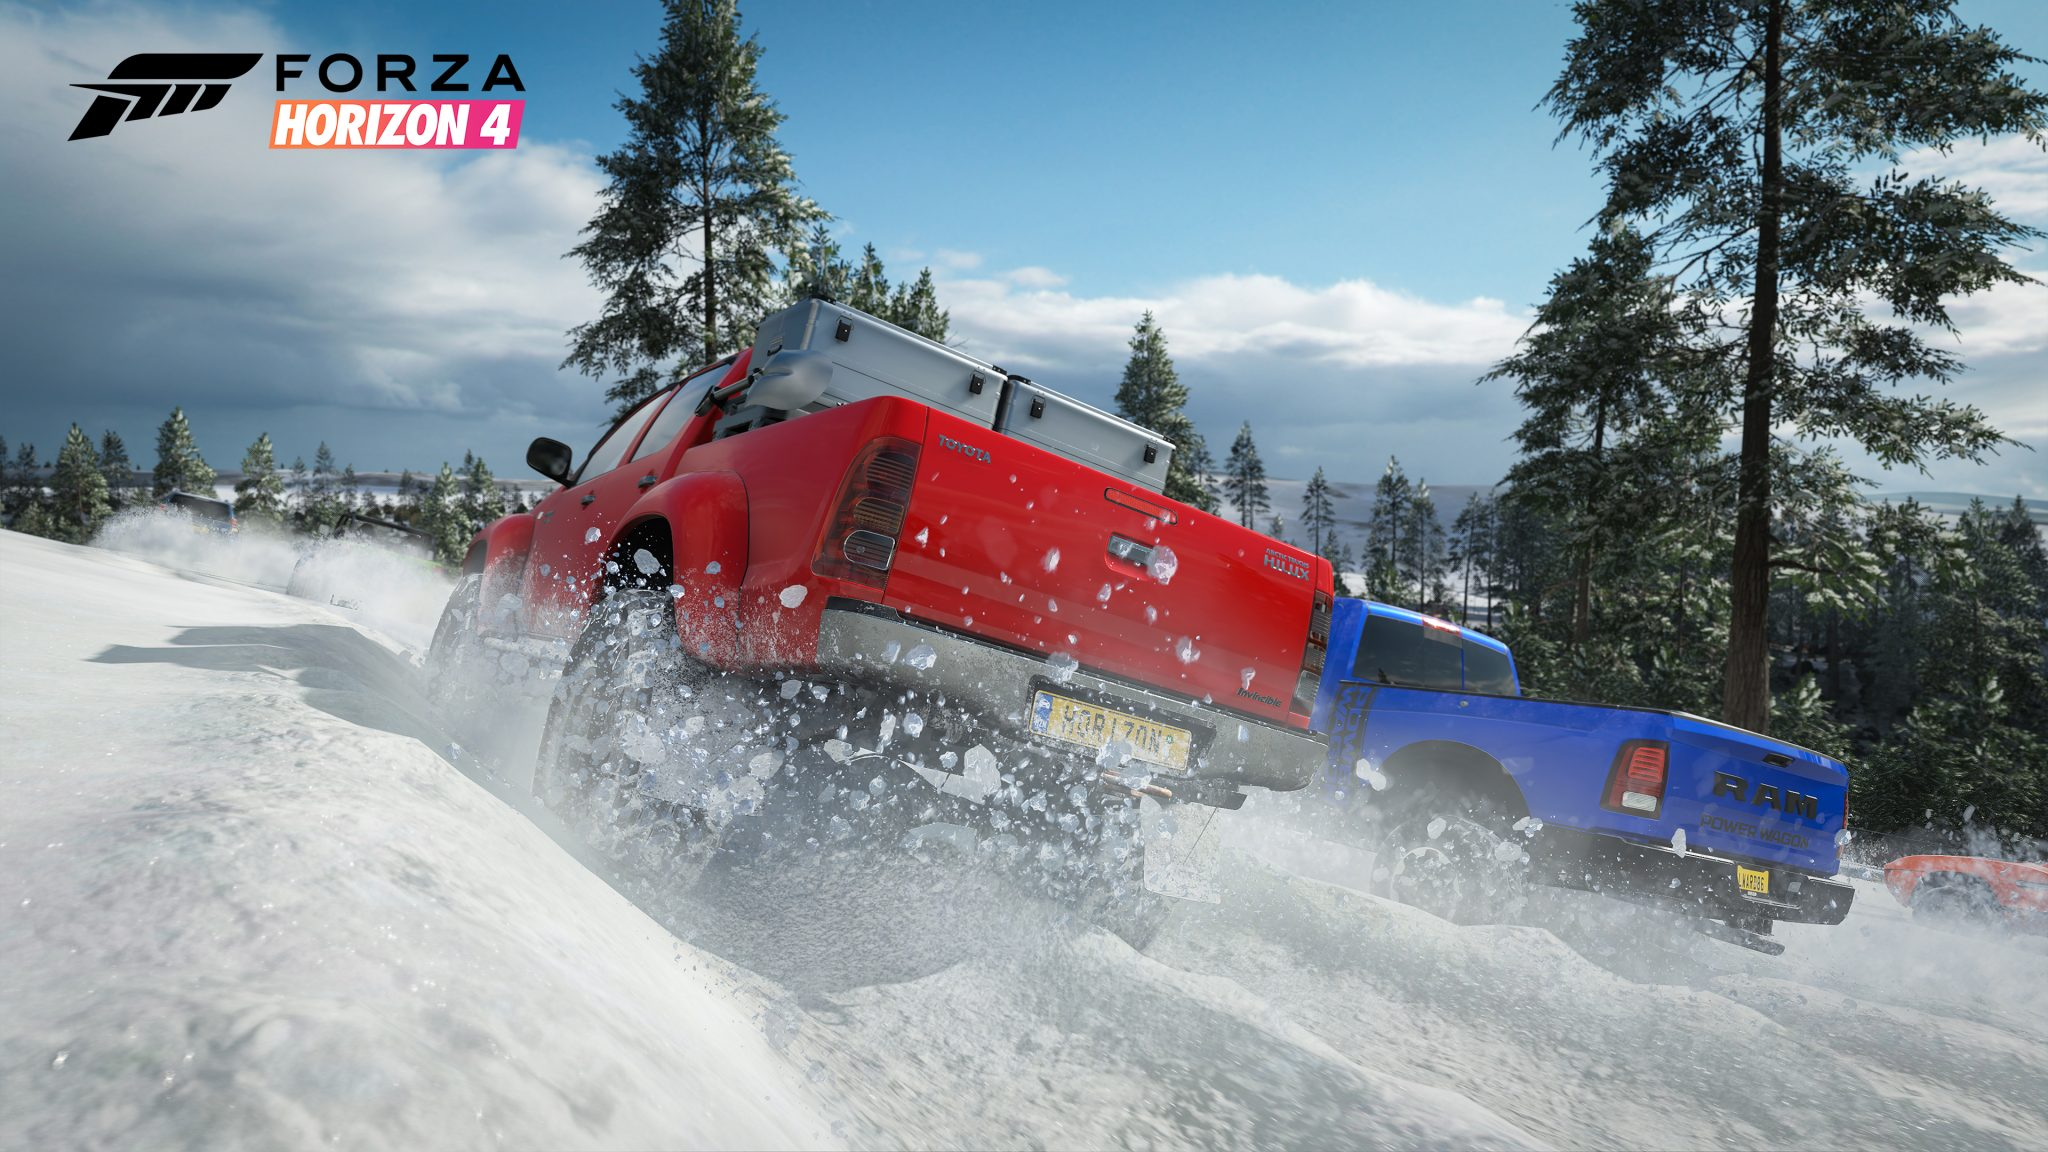 Forza Horizon 4 FH4 Xbox One X PC Ultimate Review Test Kritik Winter